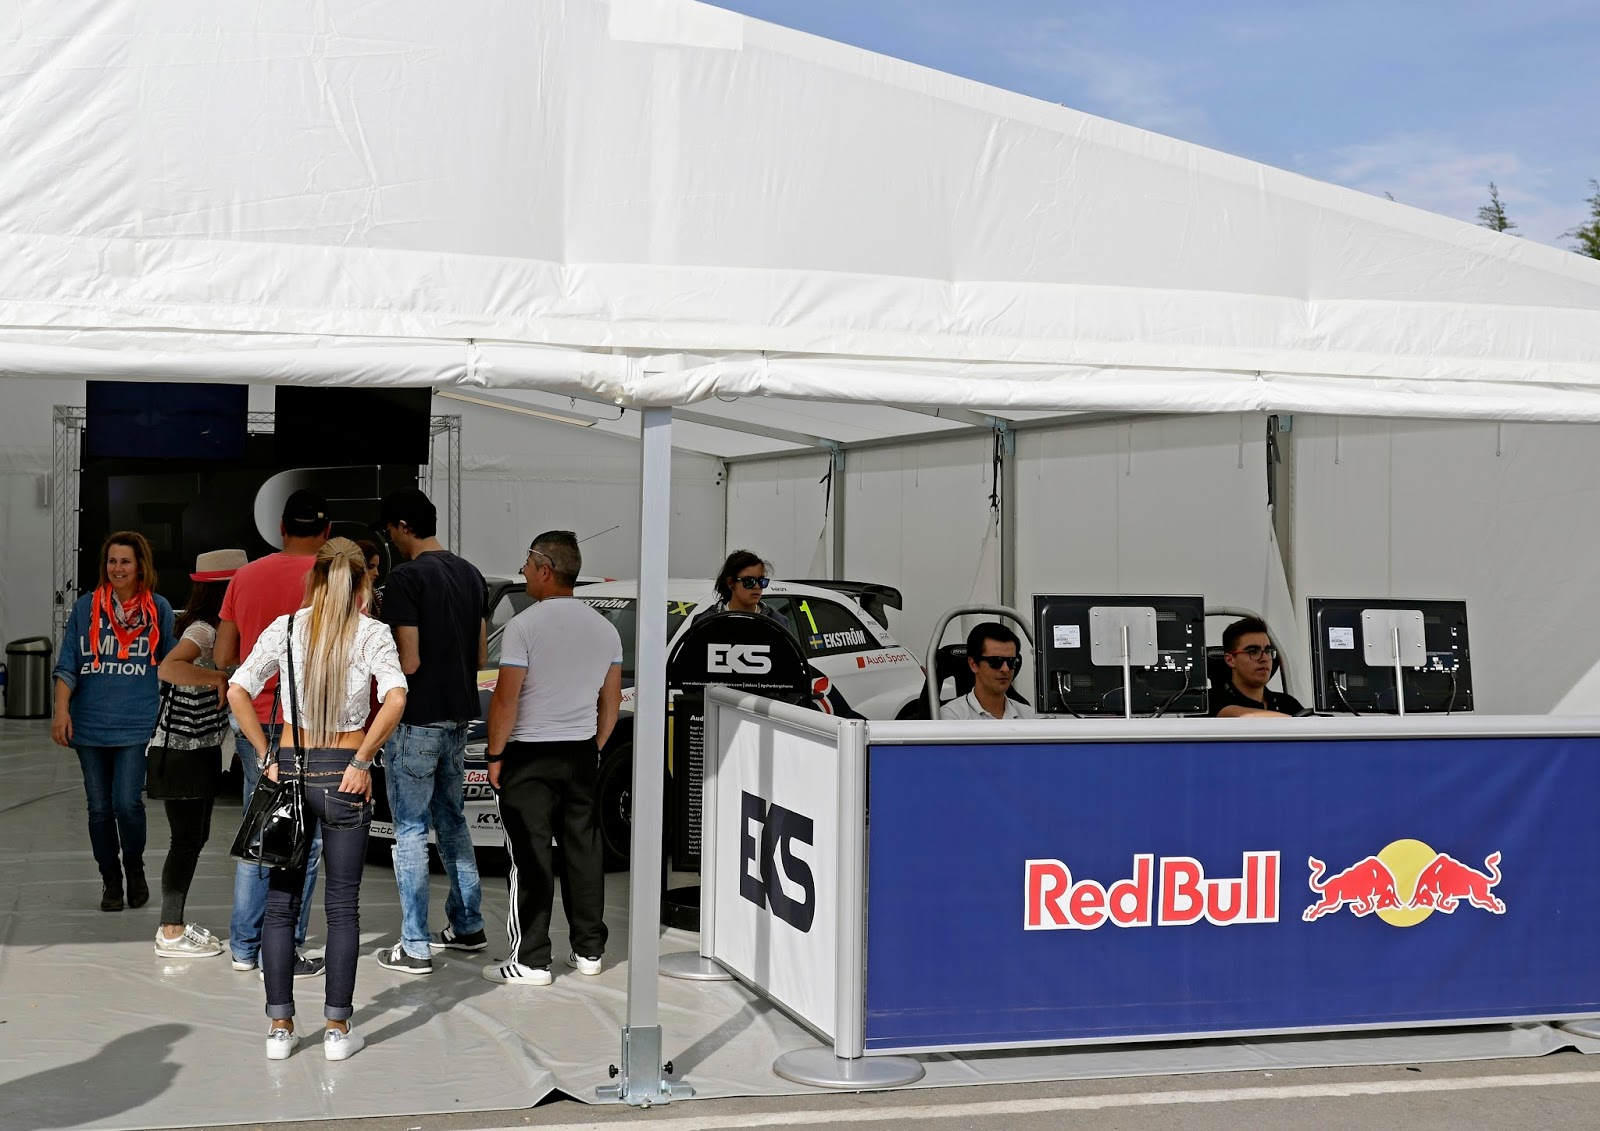 A173359 large 1 Δες όλο τον αγώνα του συναρπαστικού Rallycross FIA, FIA World Rallycross Championship, Rally, videos, World RX